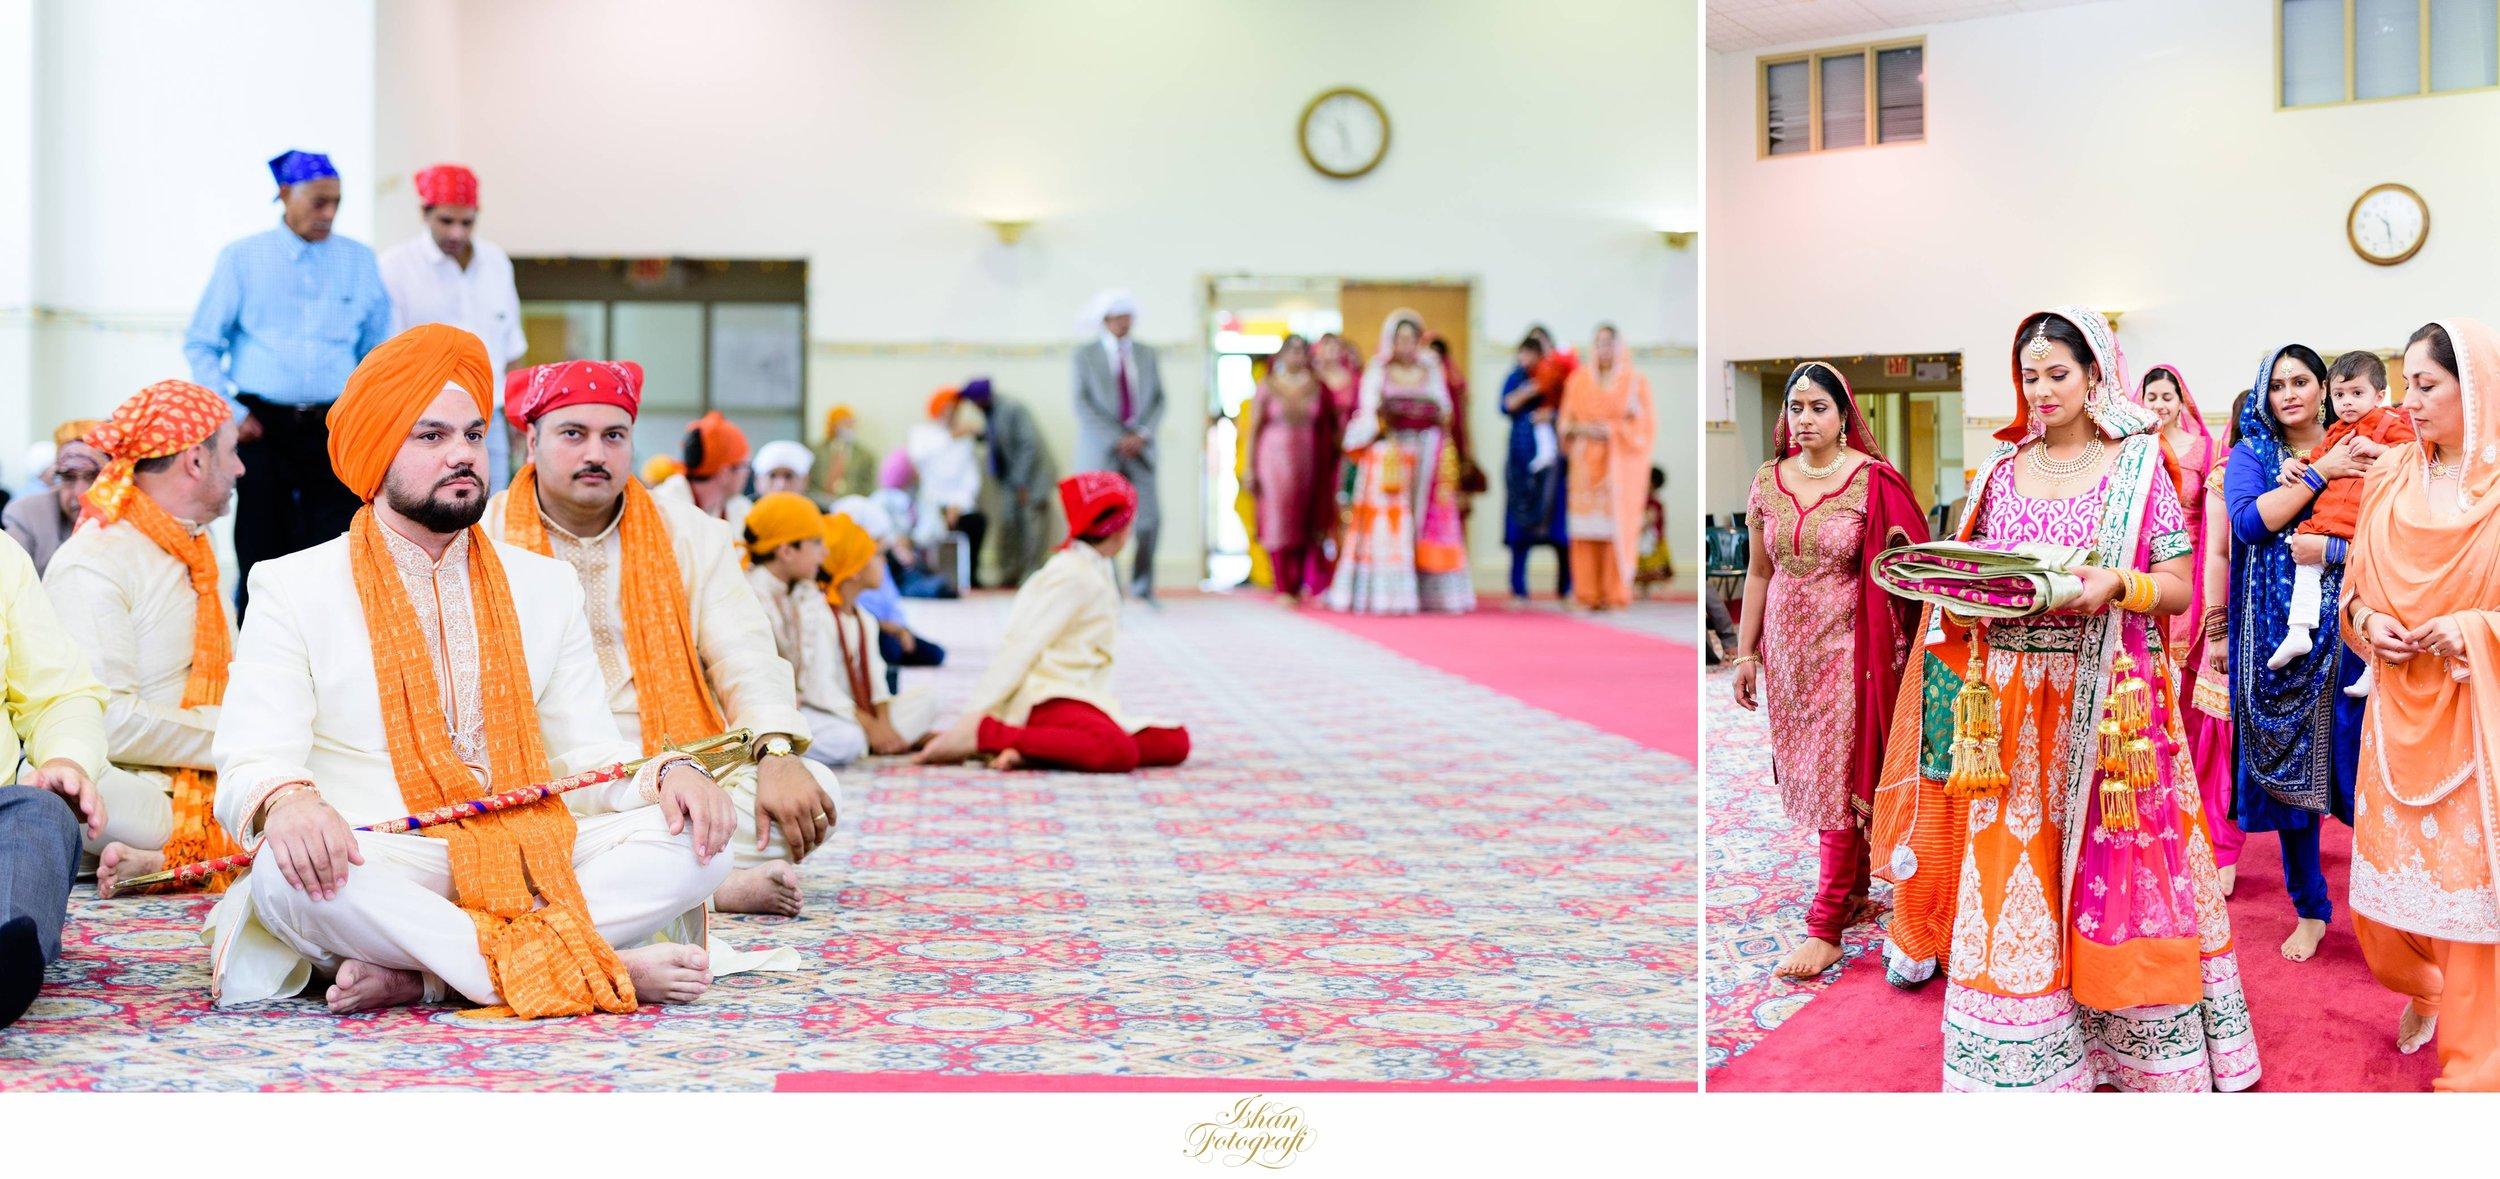 A traditional sikh wedding in Pennsylvania gurdwara. This was a traditional south asian wedding.